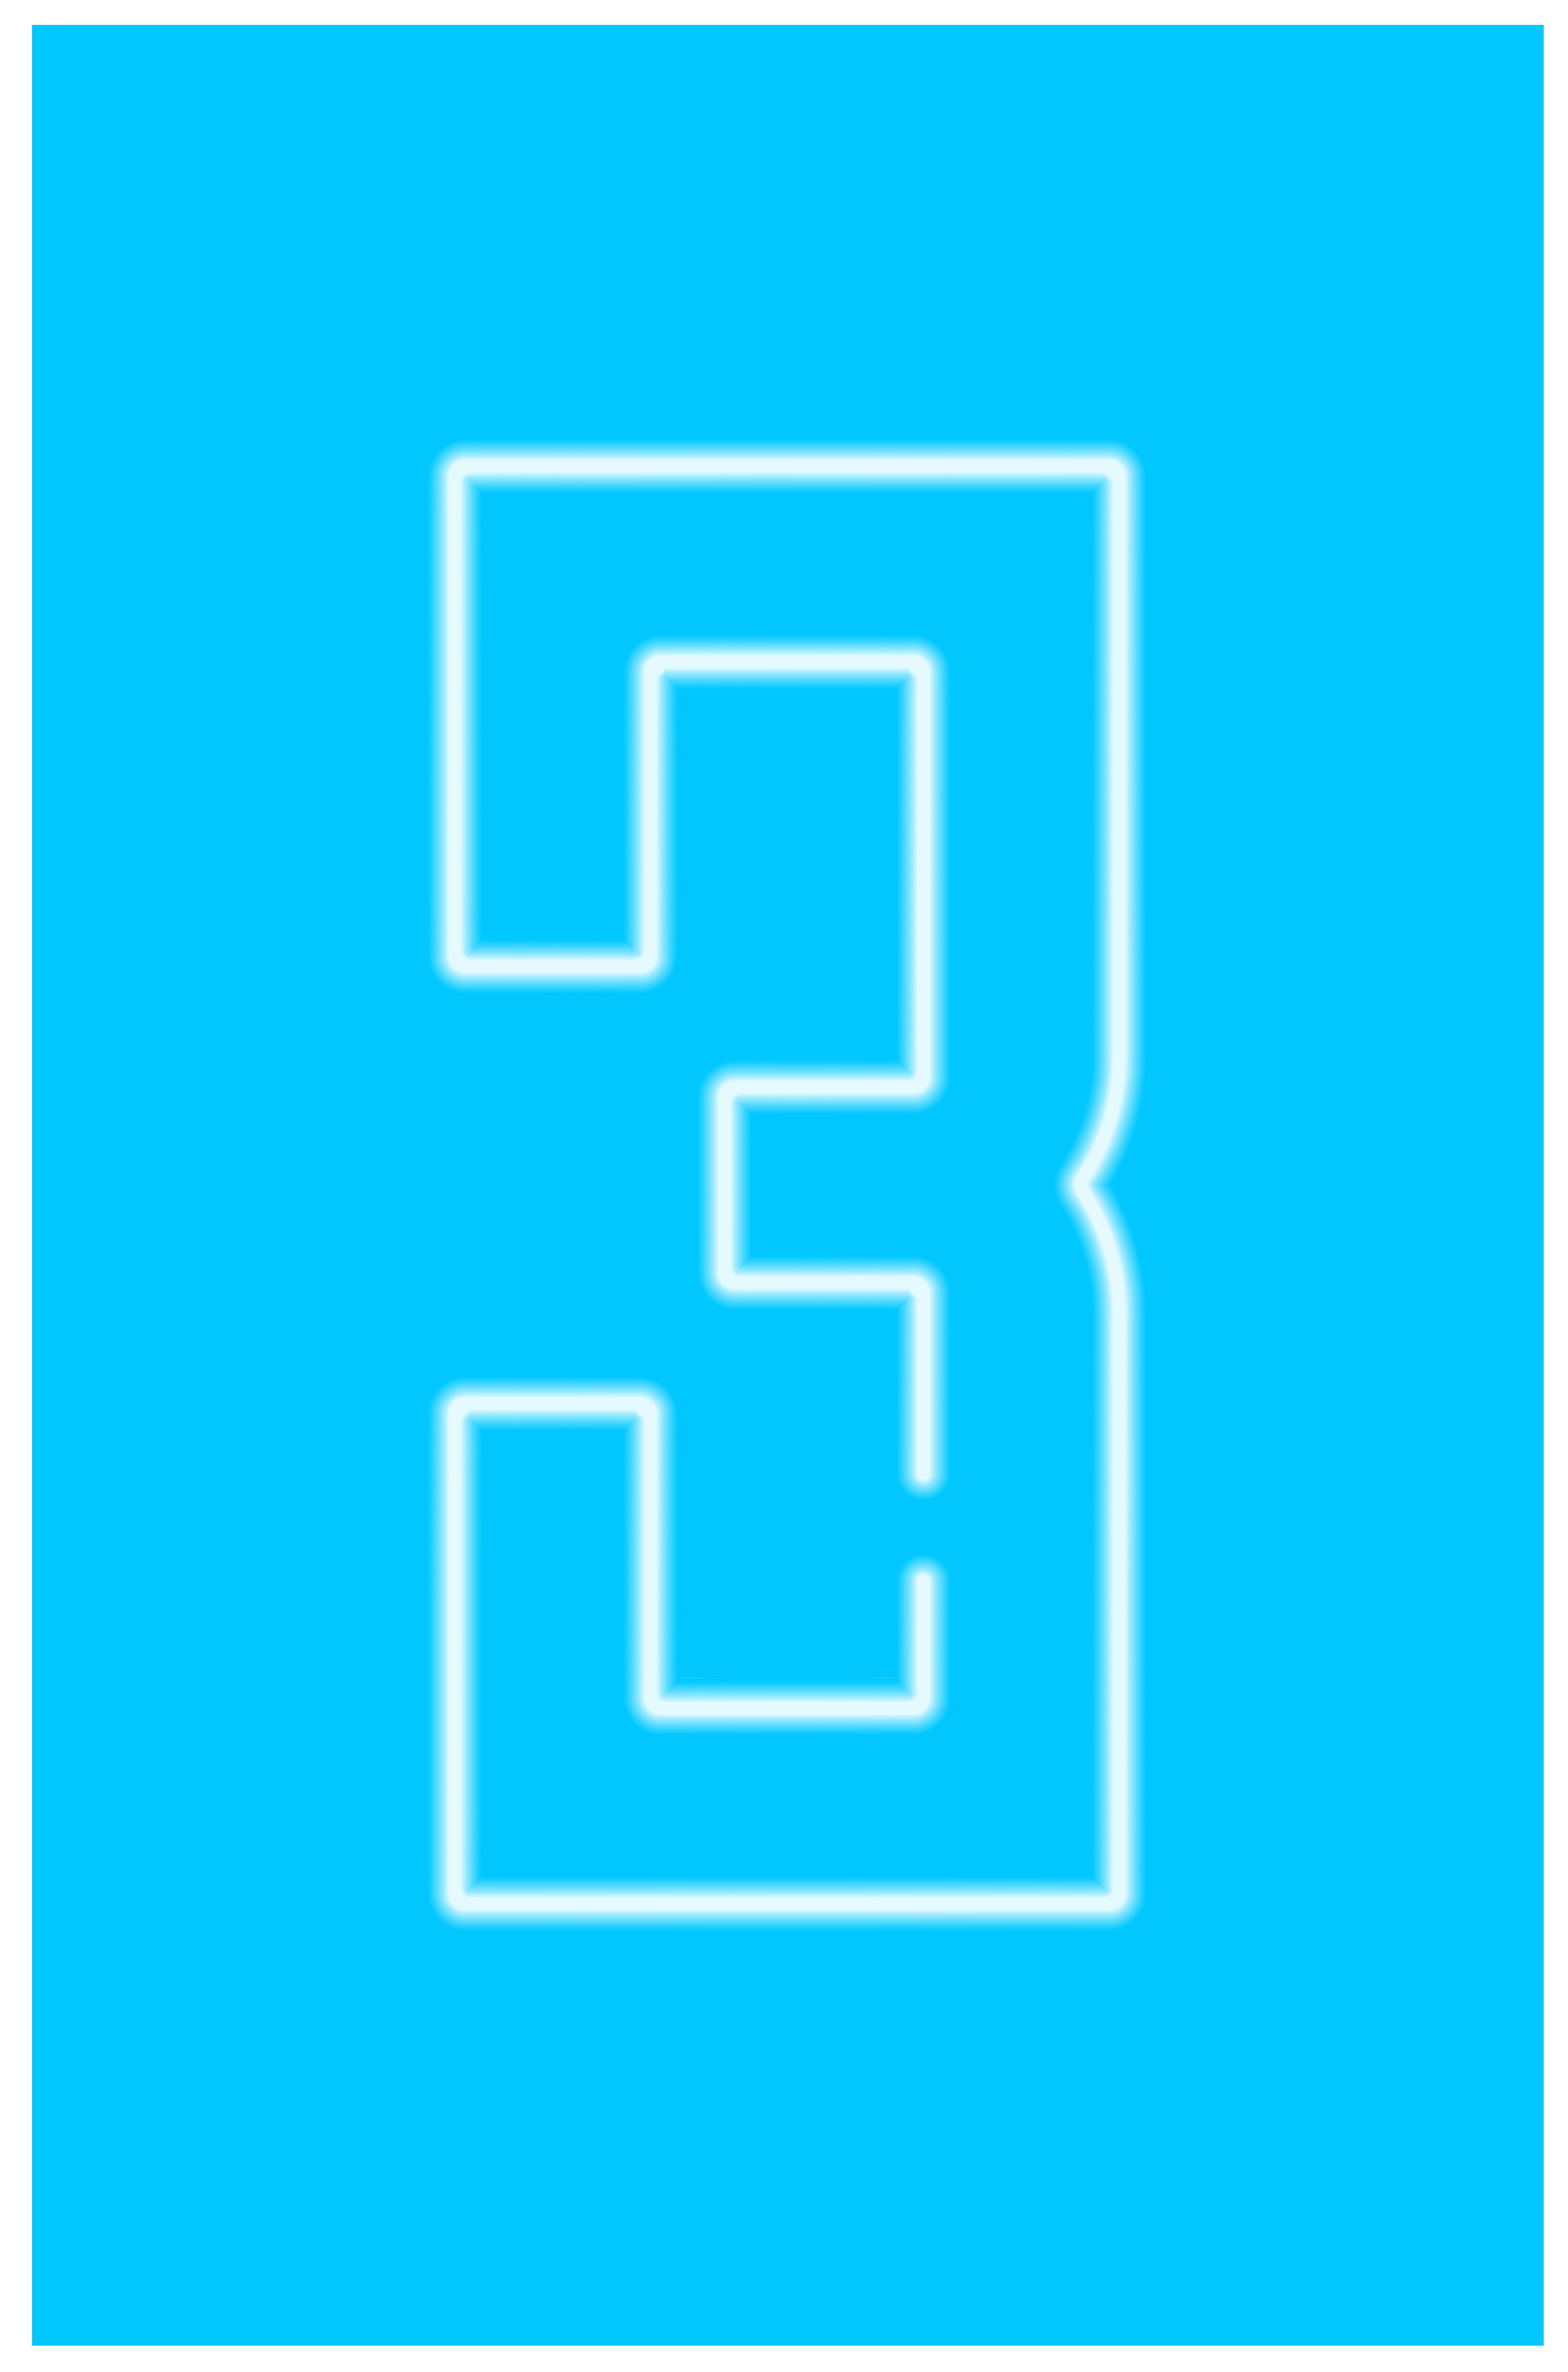 Neon Number Three Transparent Clip Art Image.